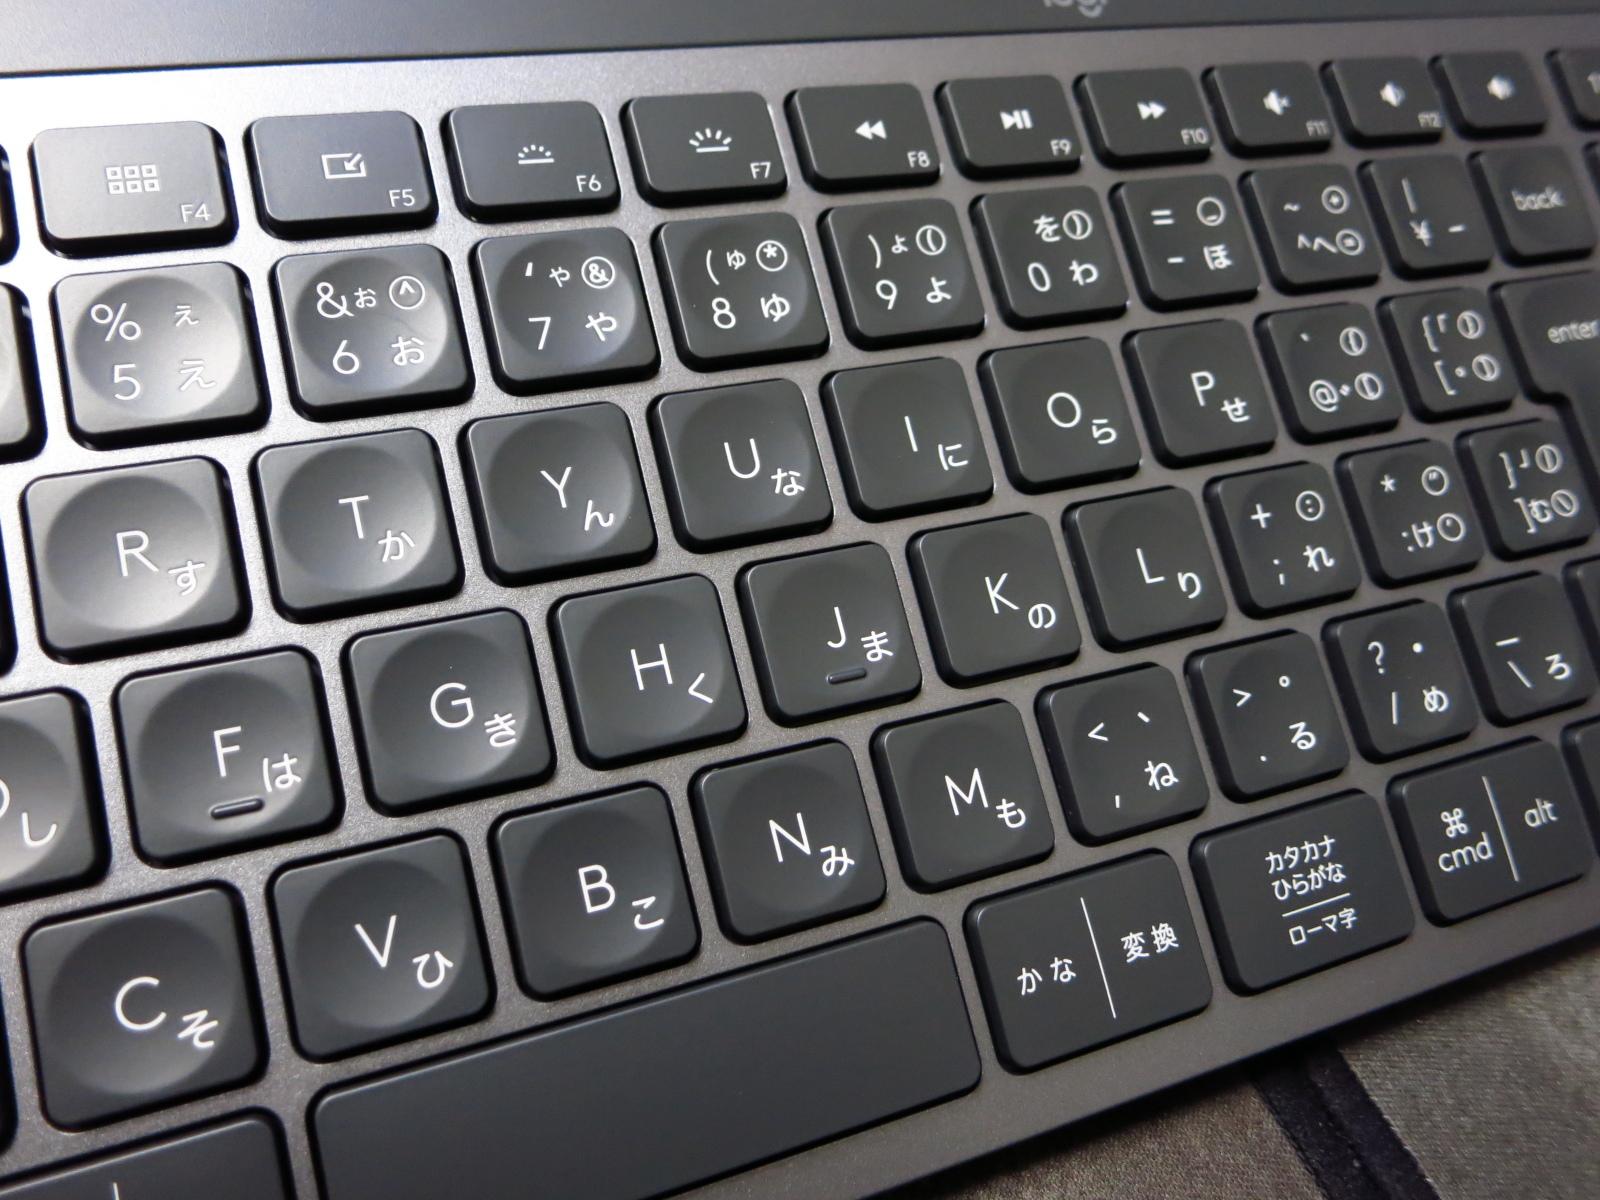 MX_Keys_11.jpg